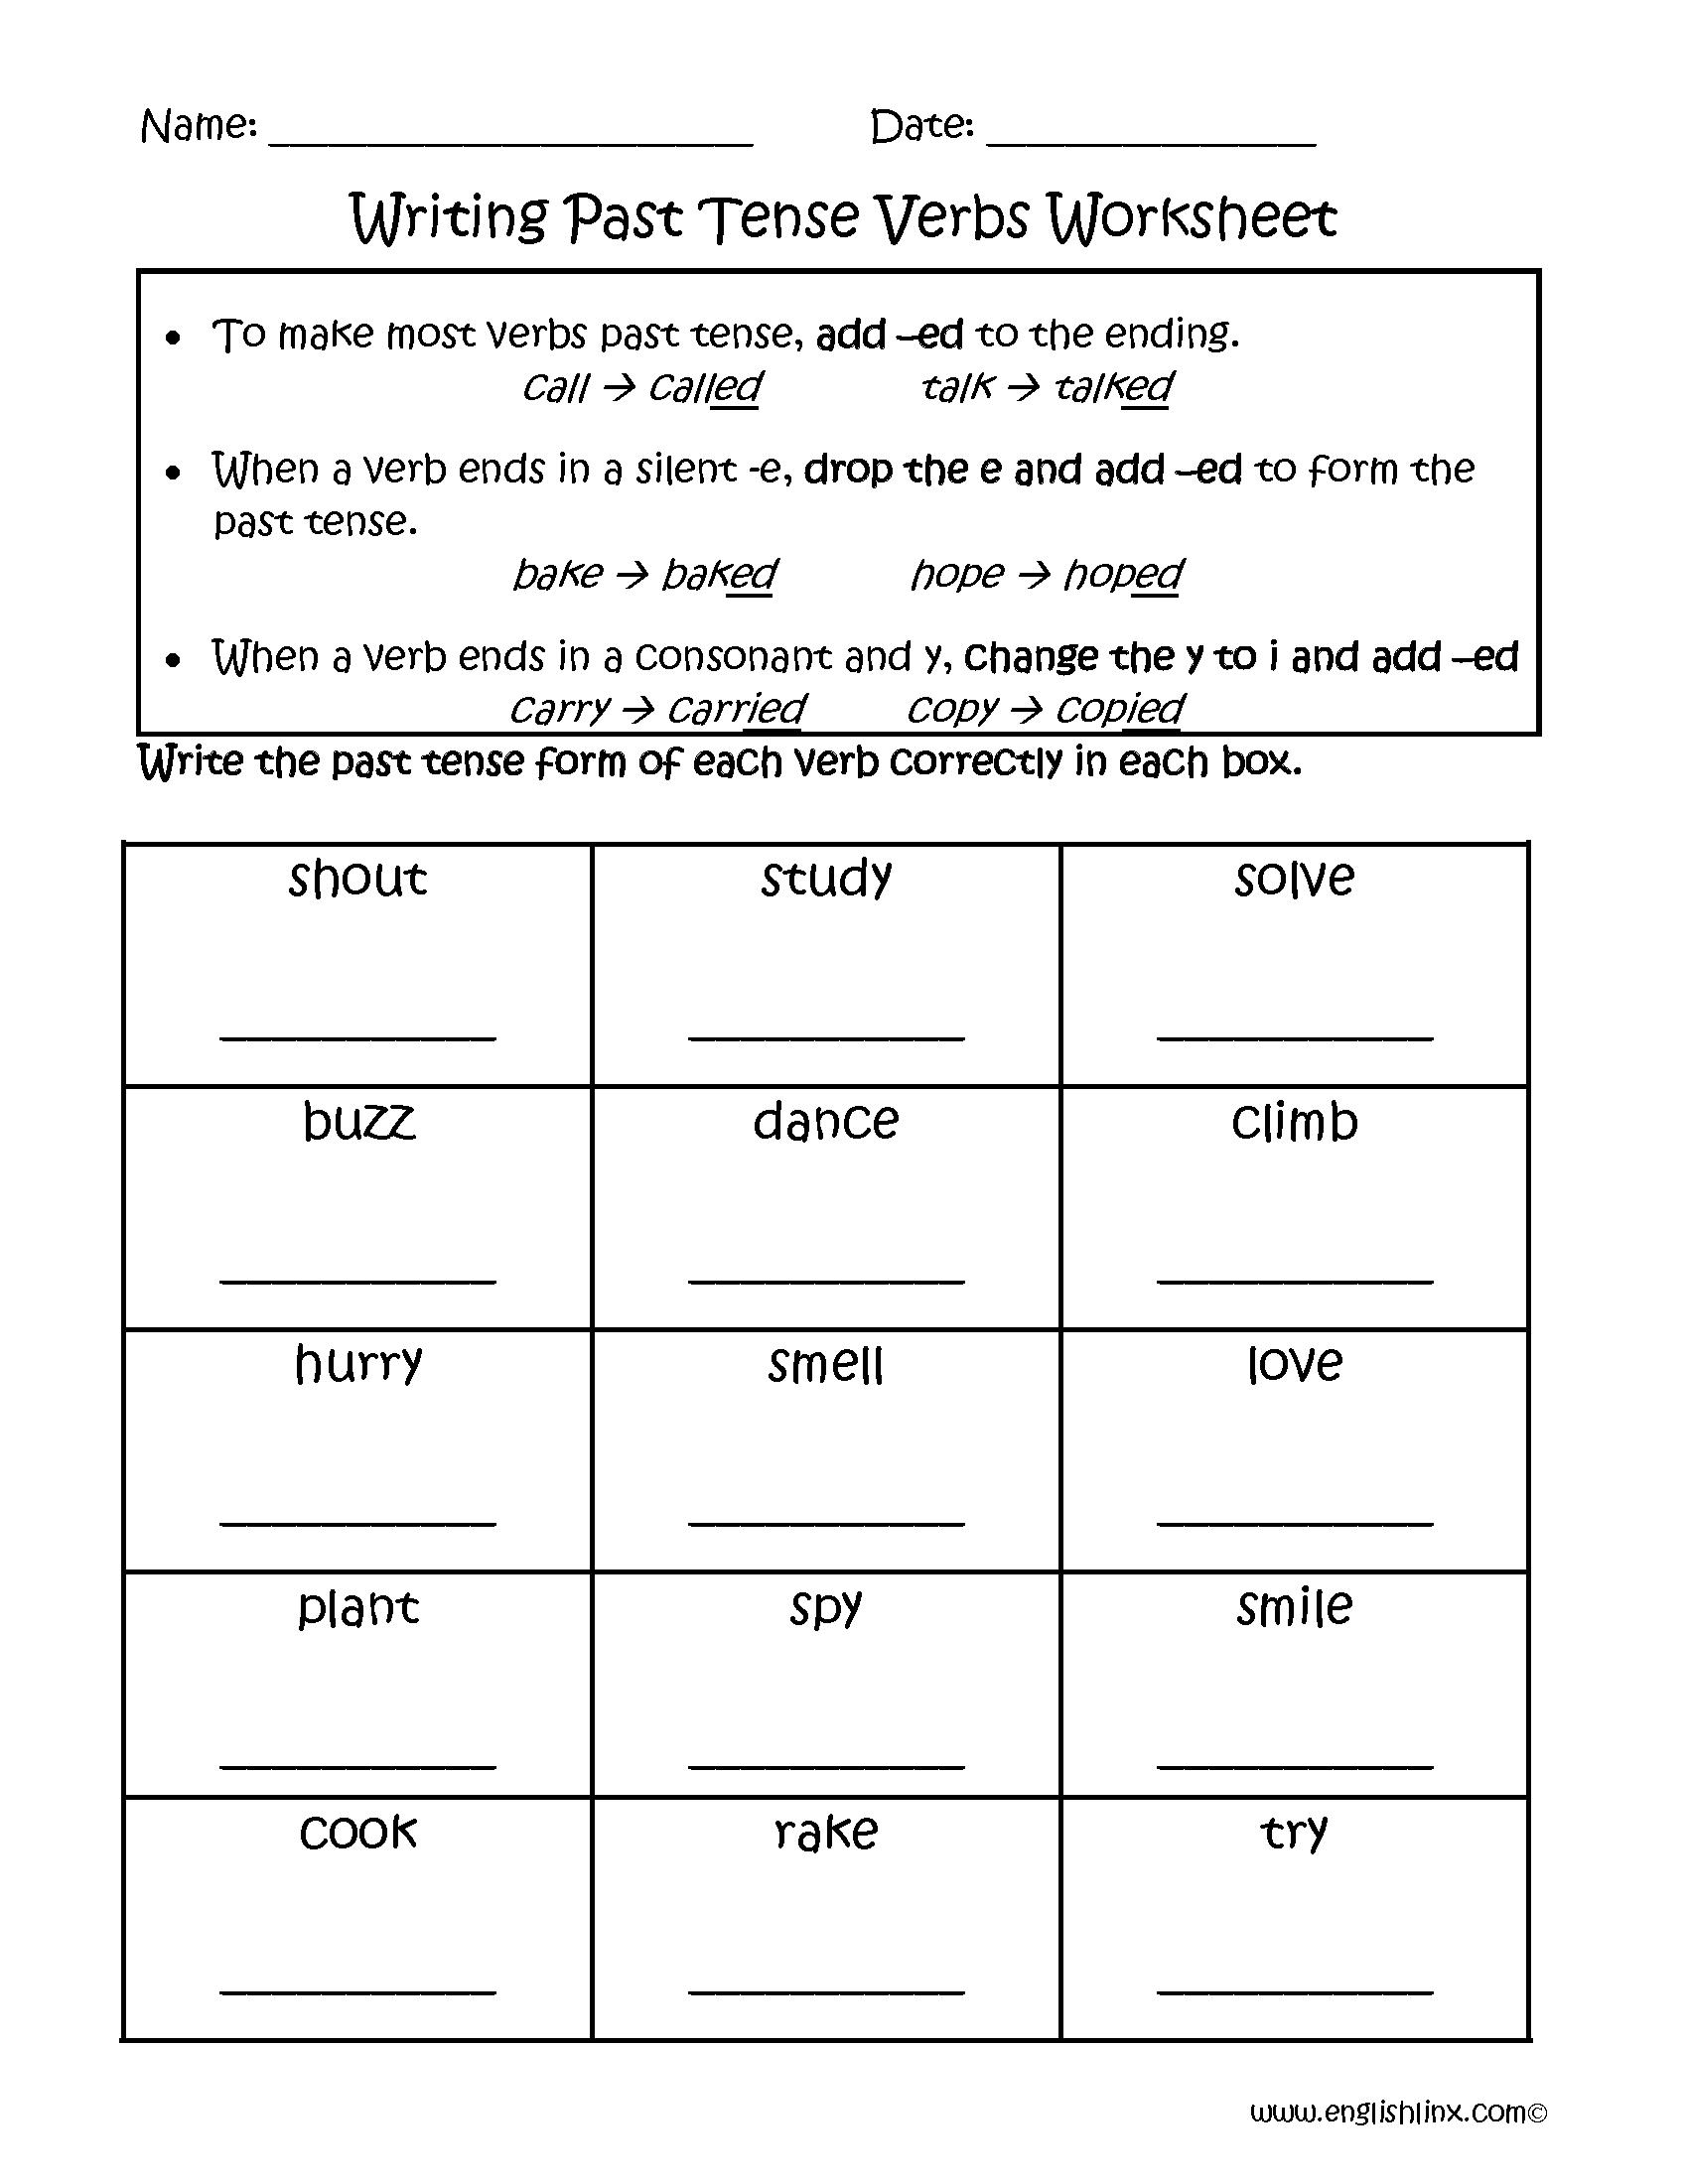 Writing Past Tense Worksheets